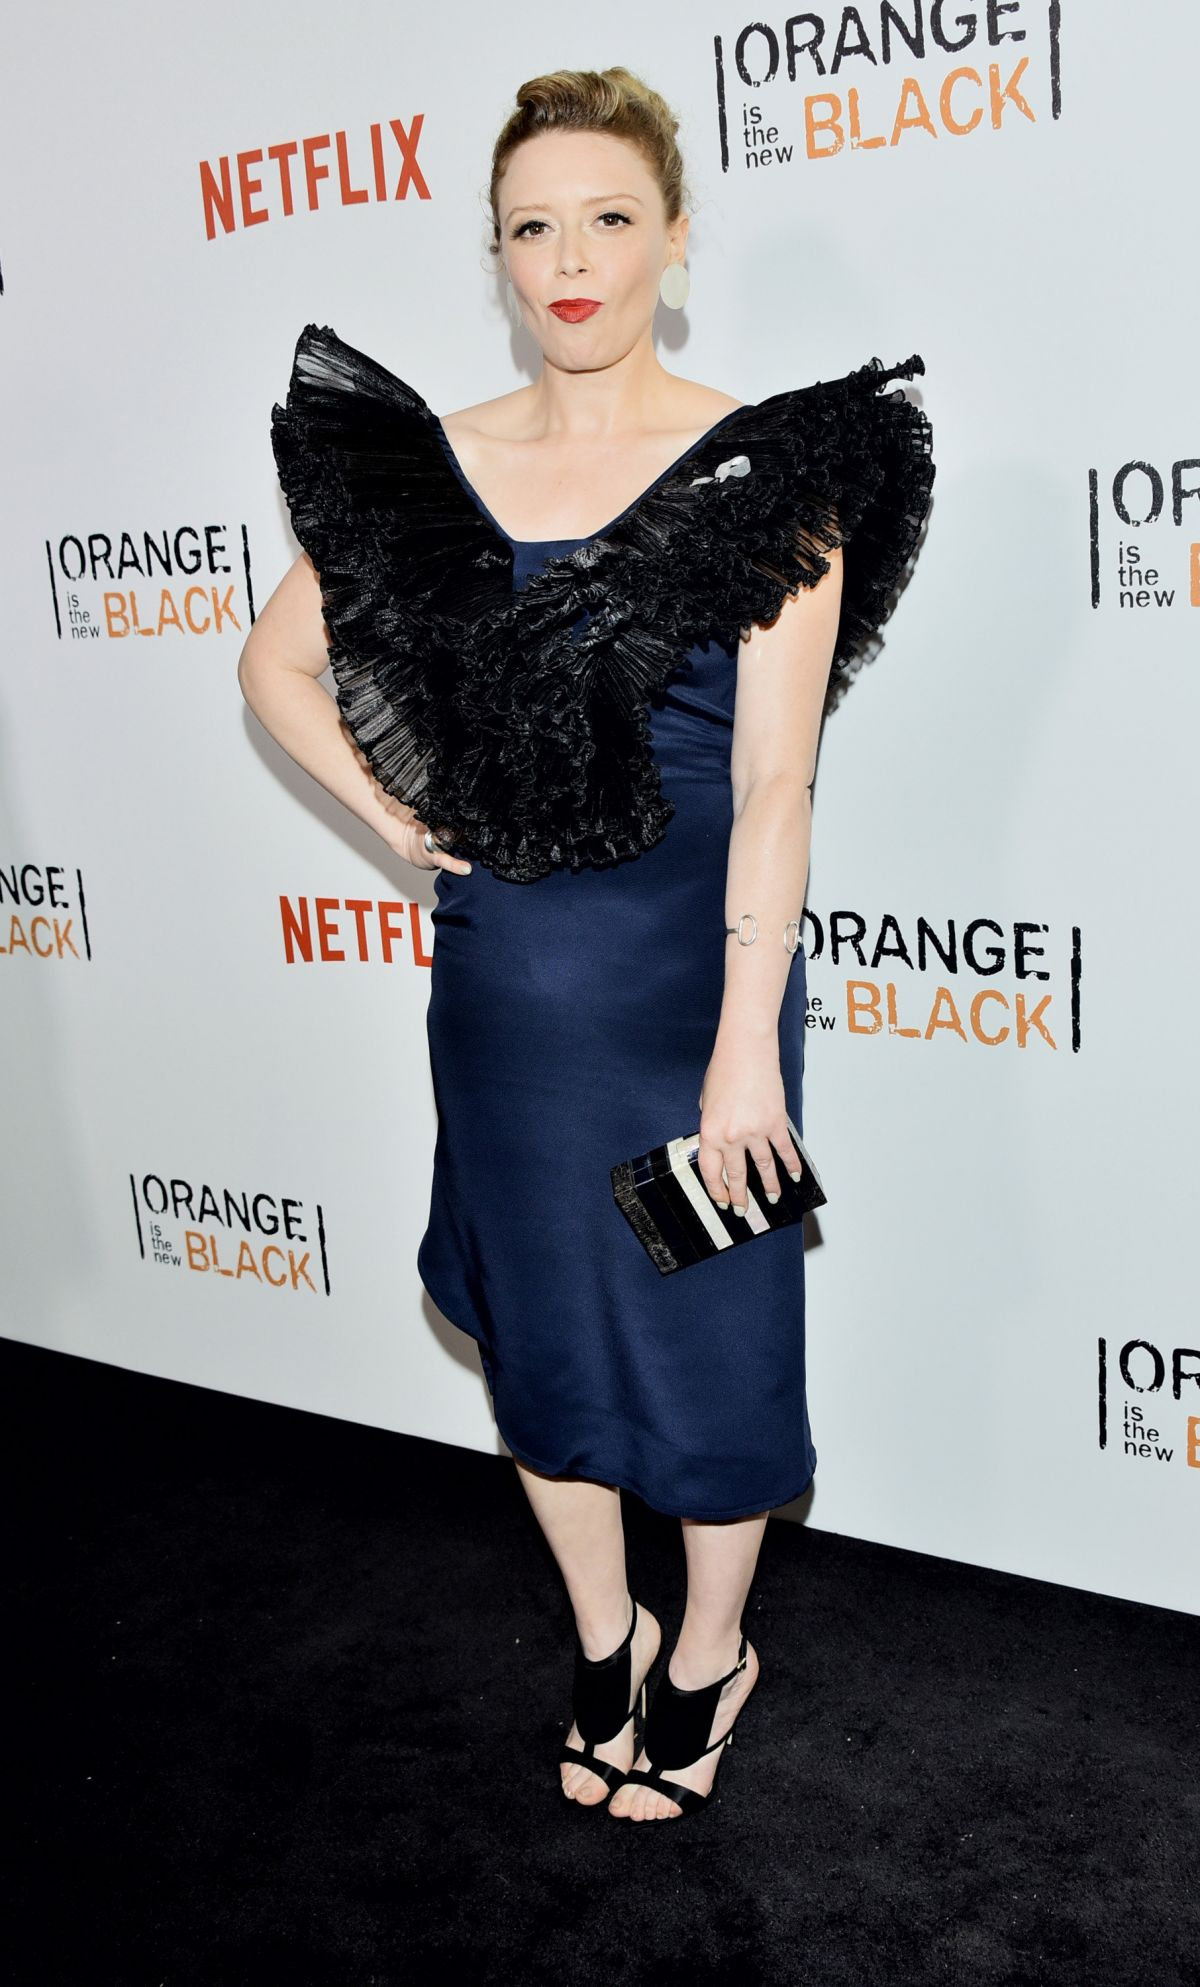 NATASHA LYONNE at Orange is the New Black Season 4 Premiere in New York 06/16/2016